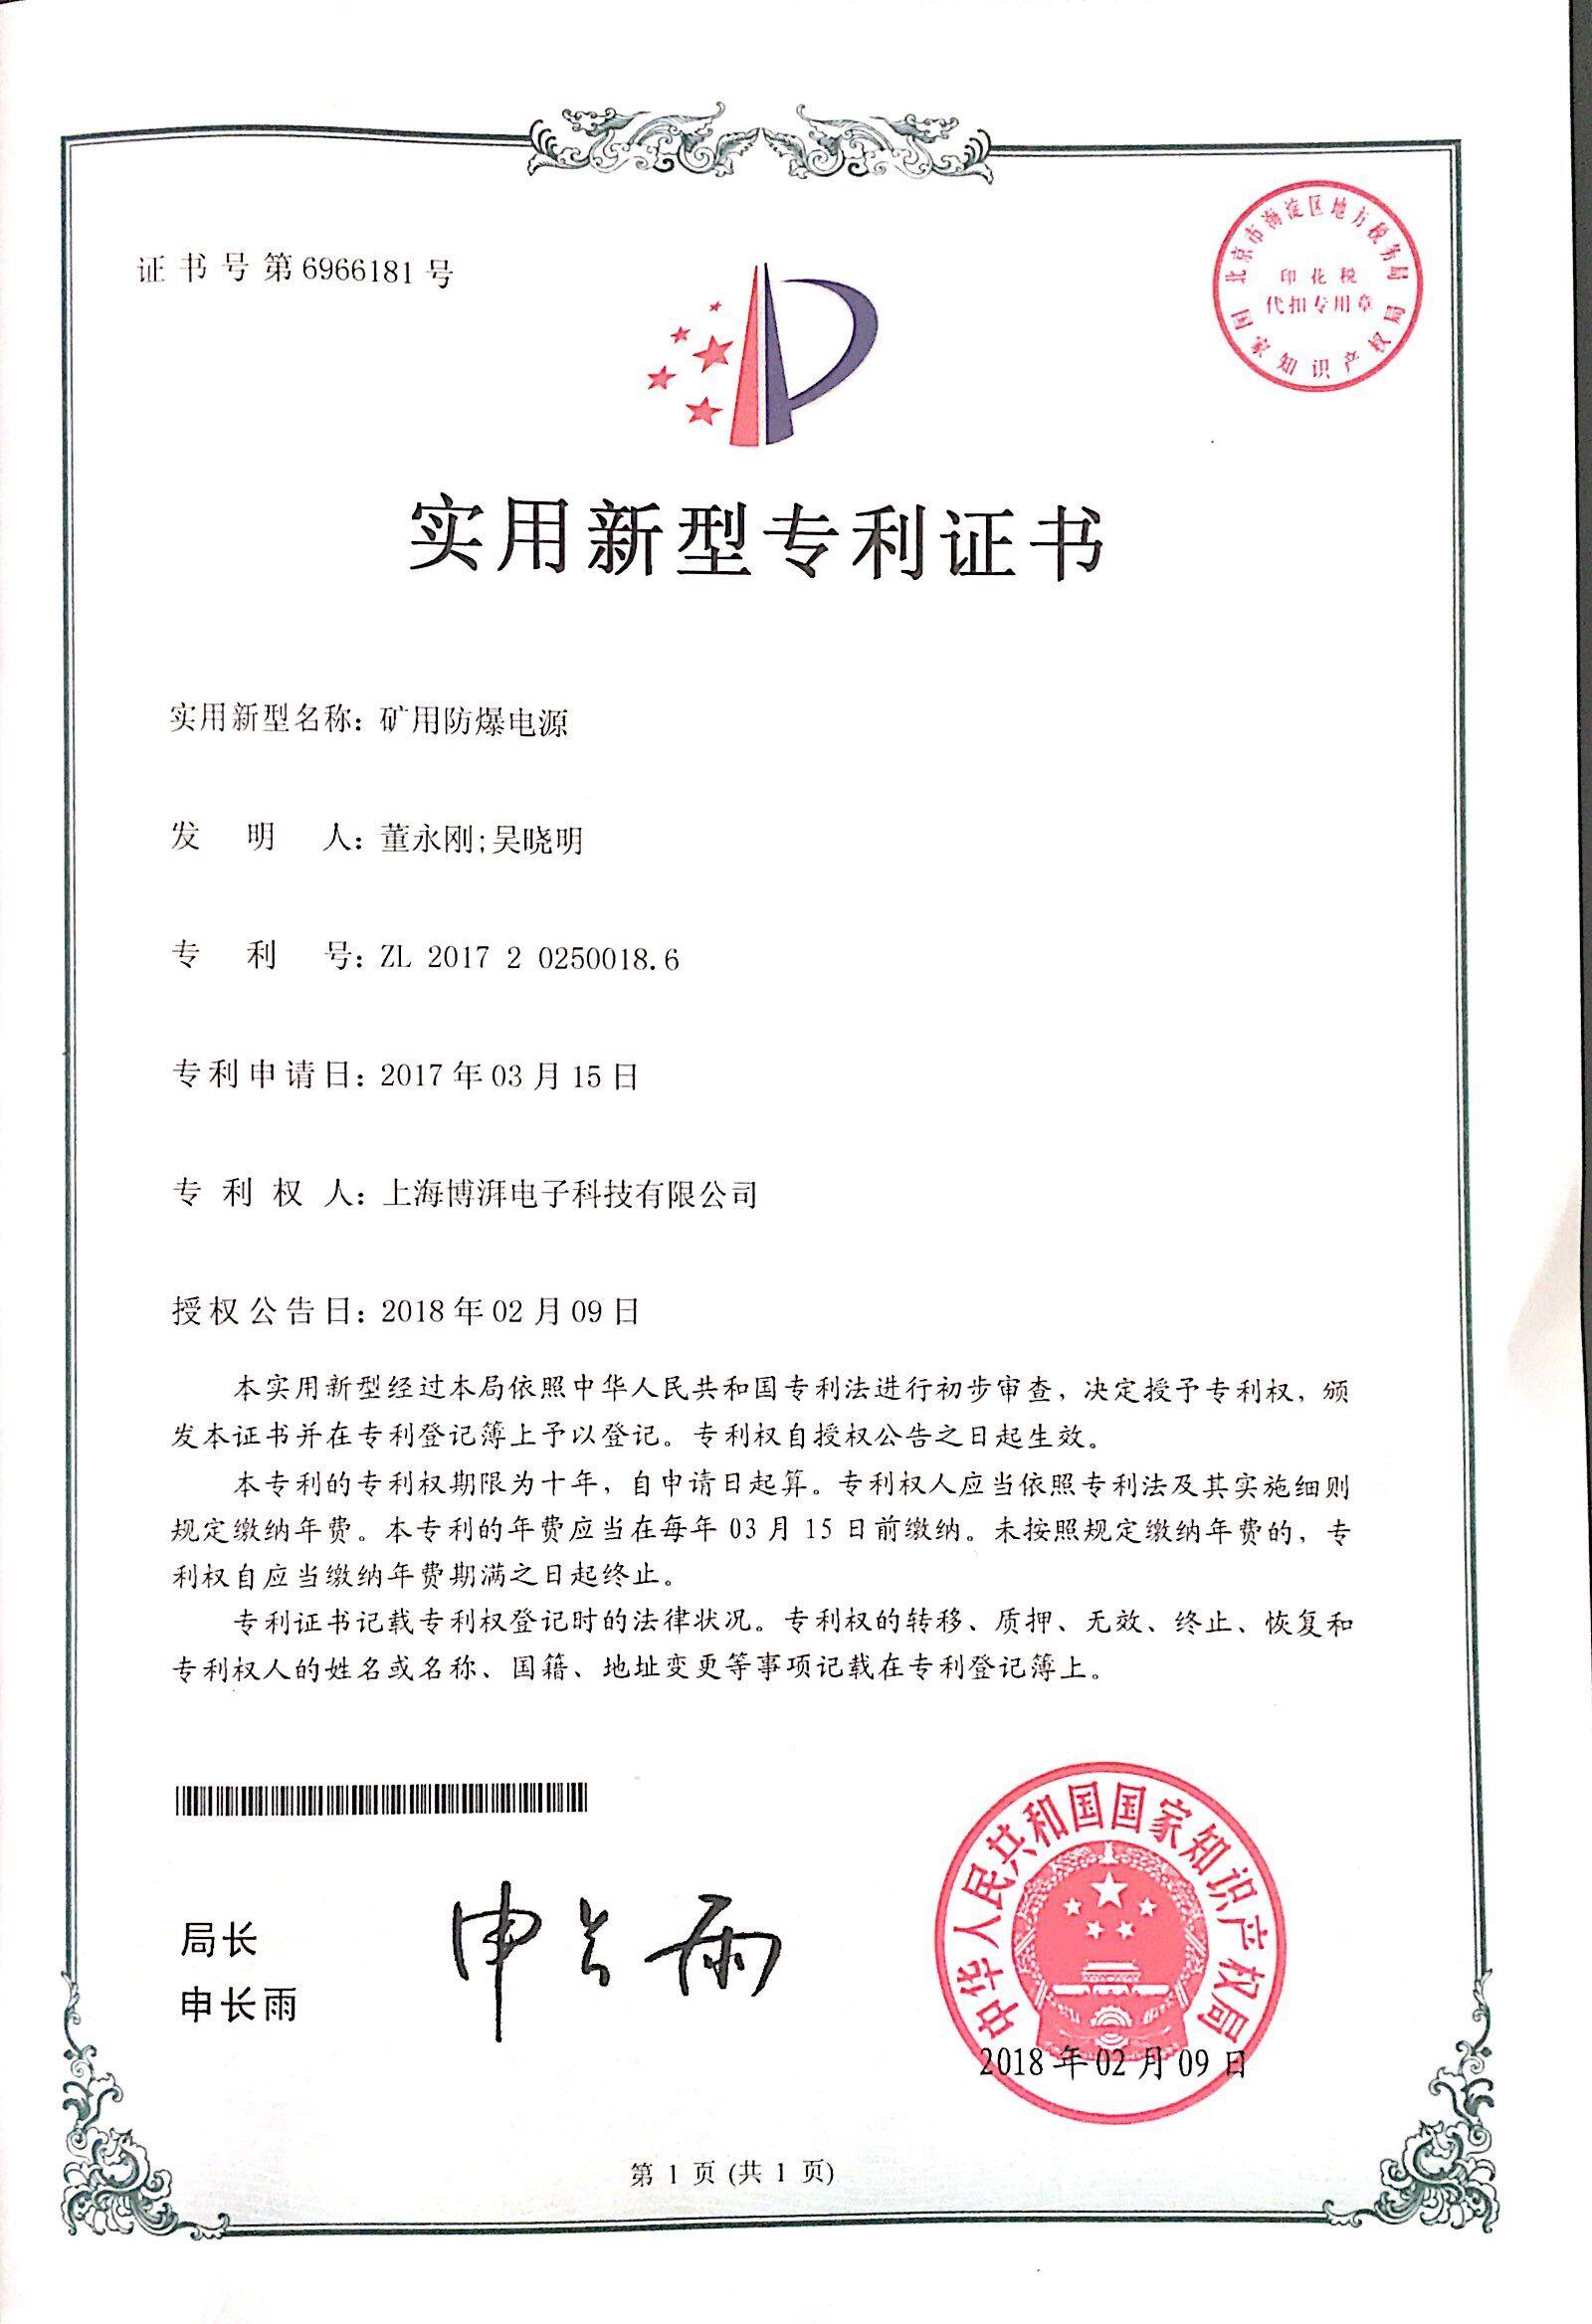 lol比赛投注-lol押注网站-lol外围app2018年又荣获2项实用新型专利证书